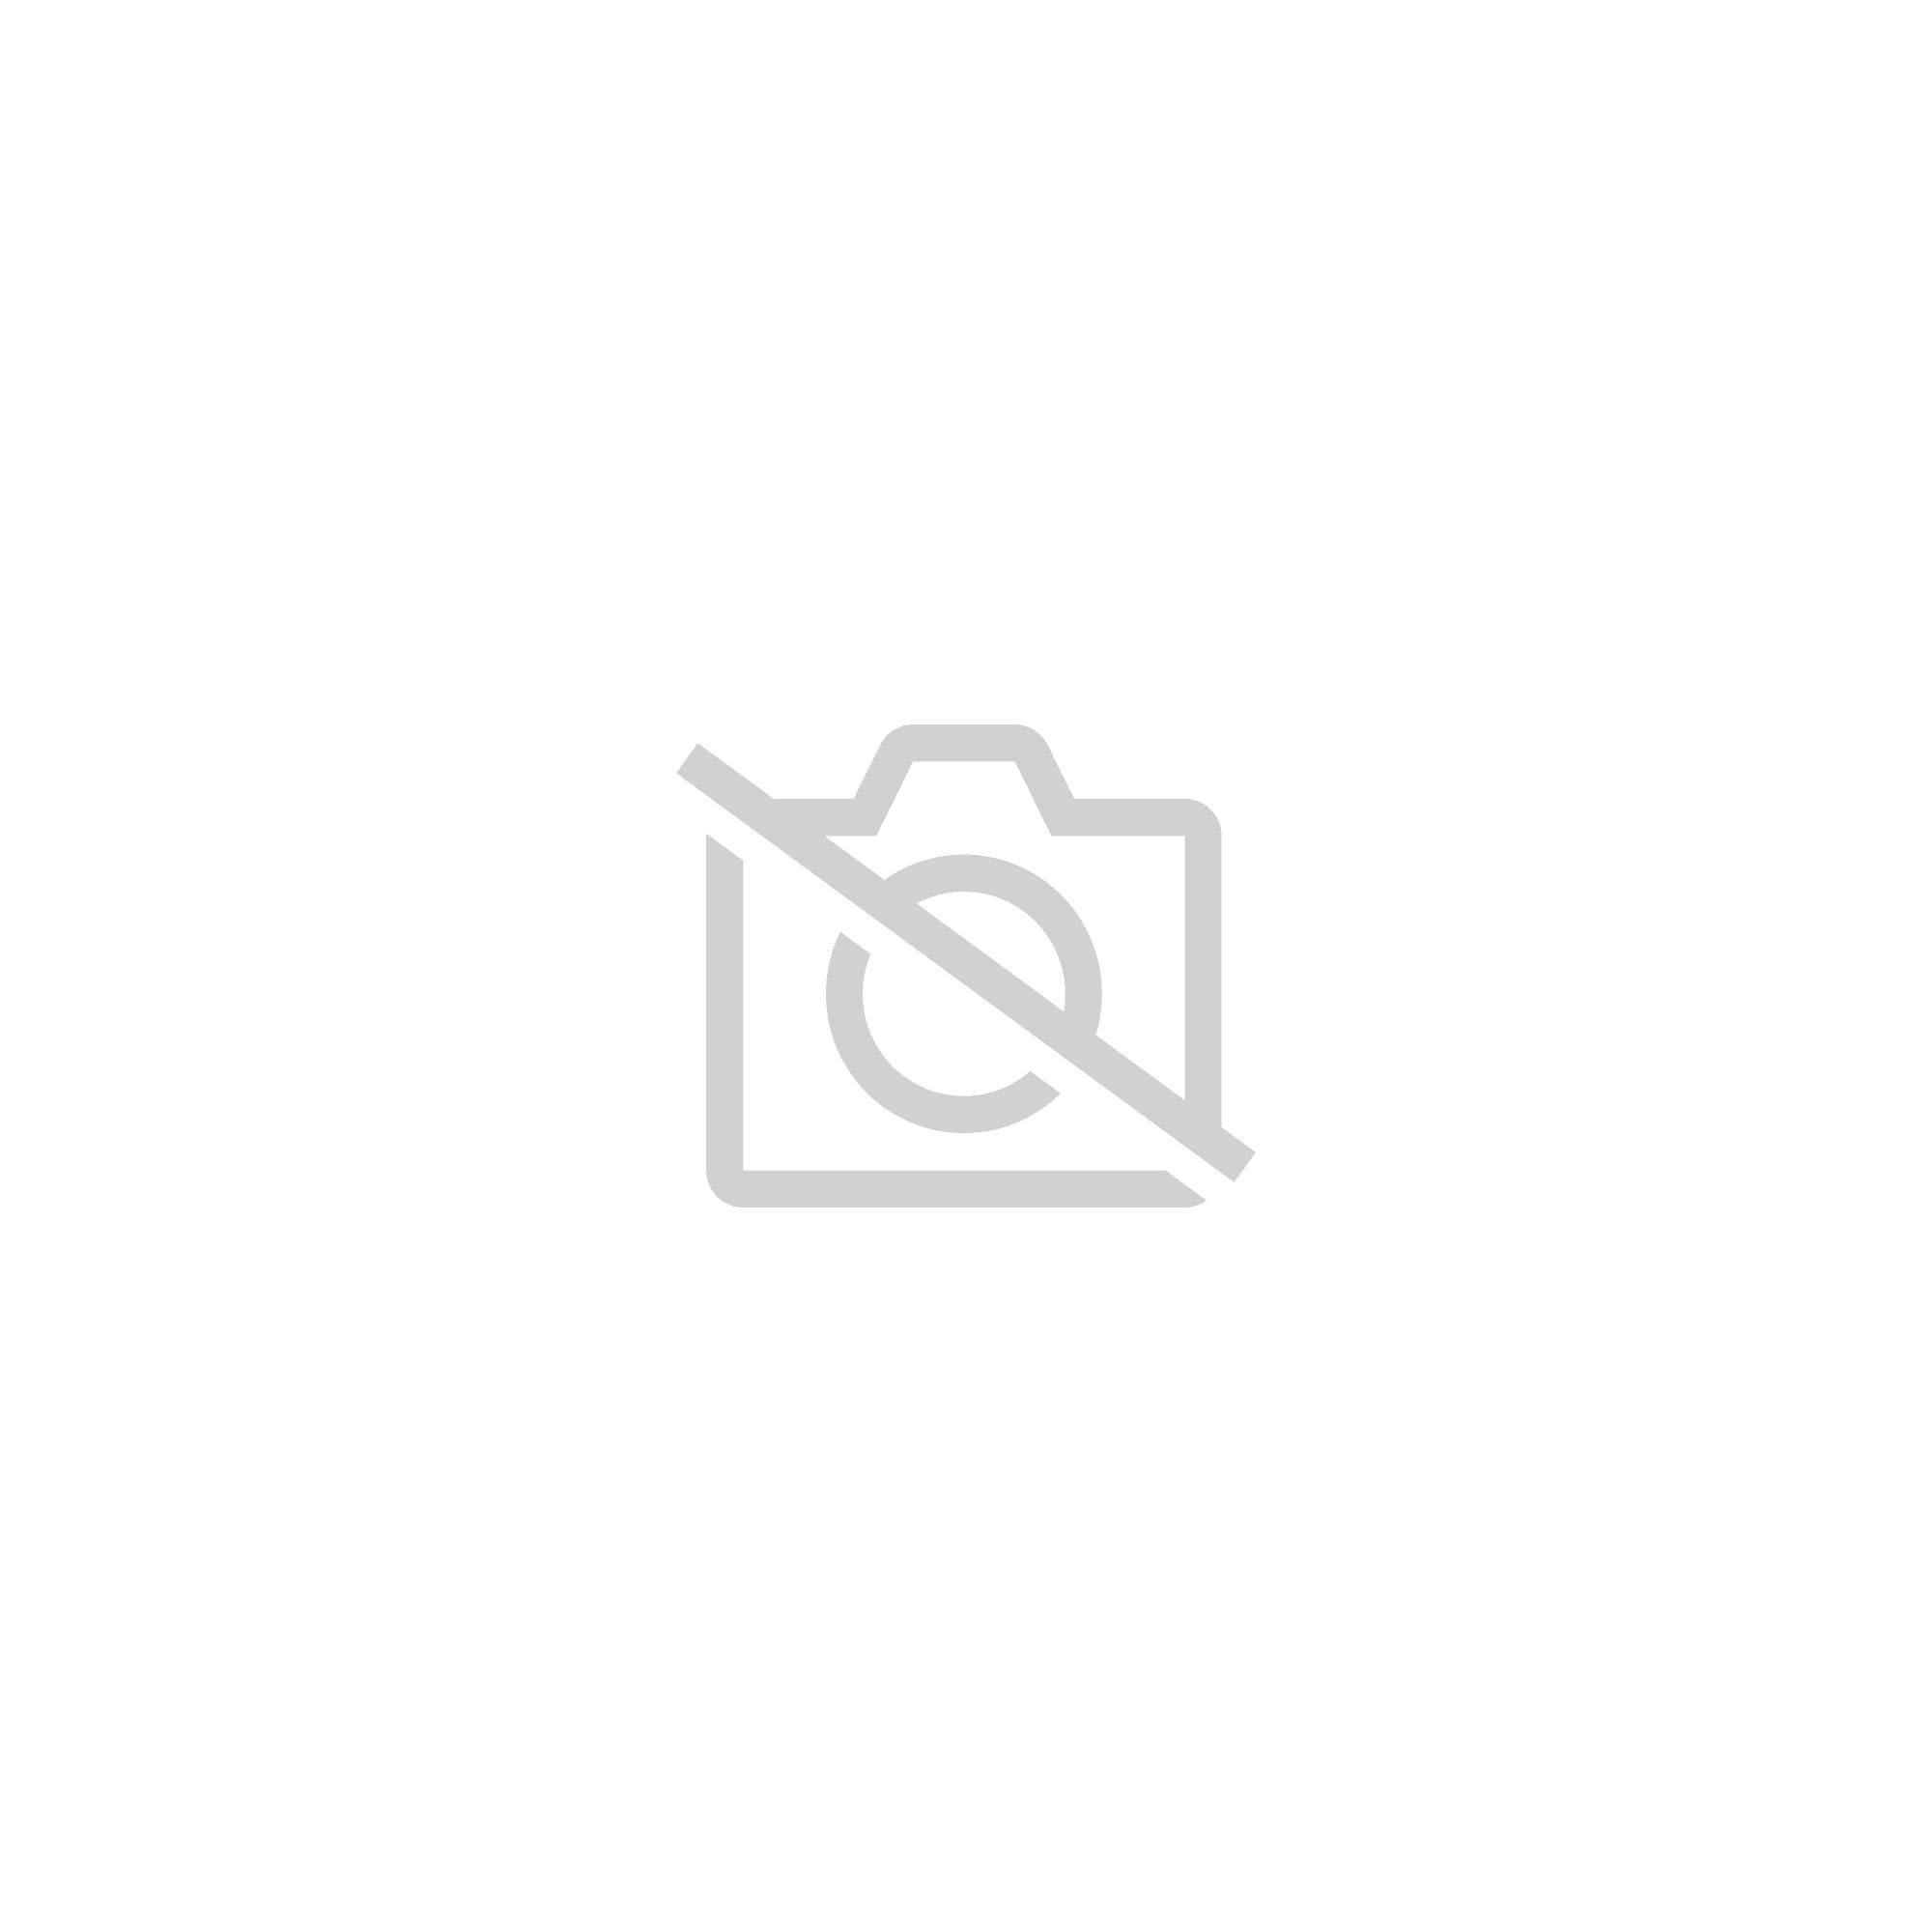 Coque Huawei P8 Lite 2017 / P9 Lite 2017 Silicone motif Rugby